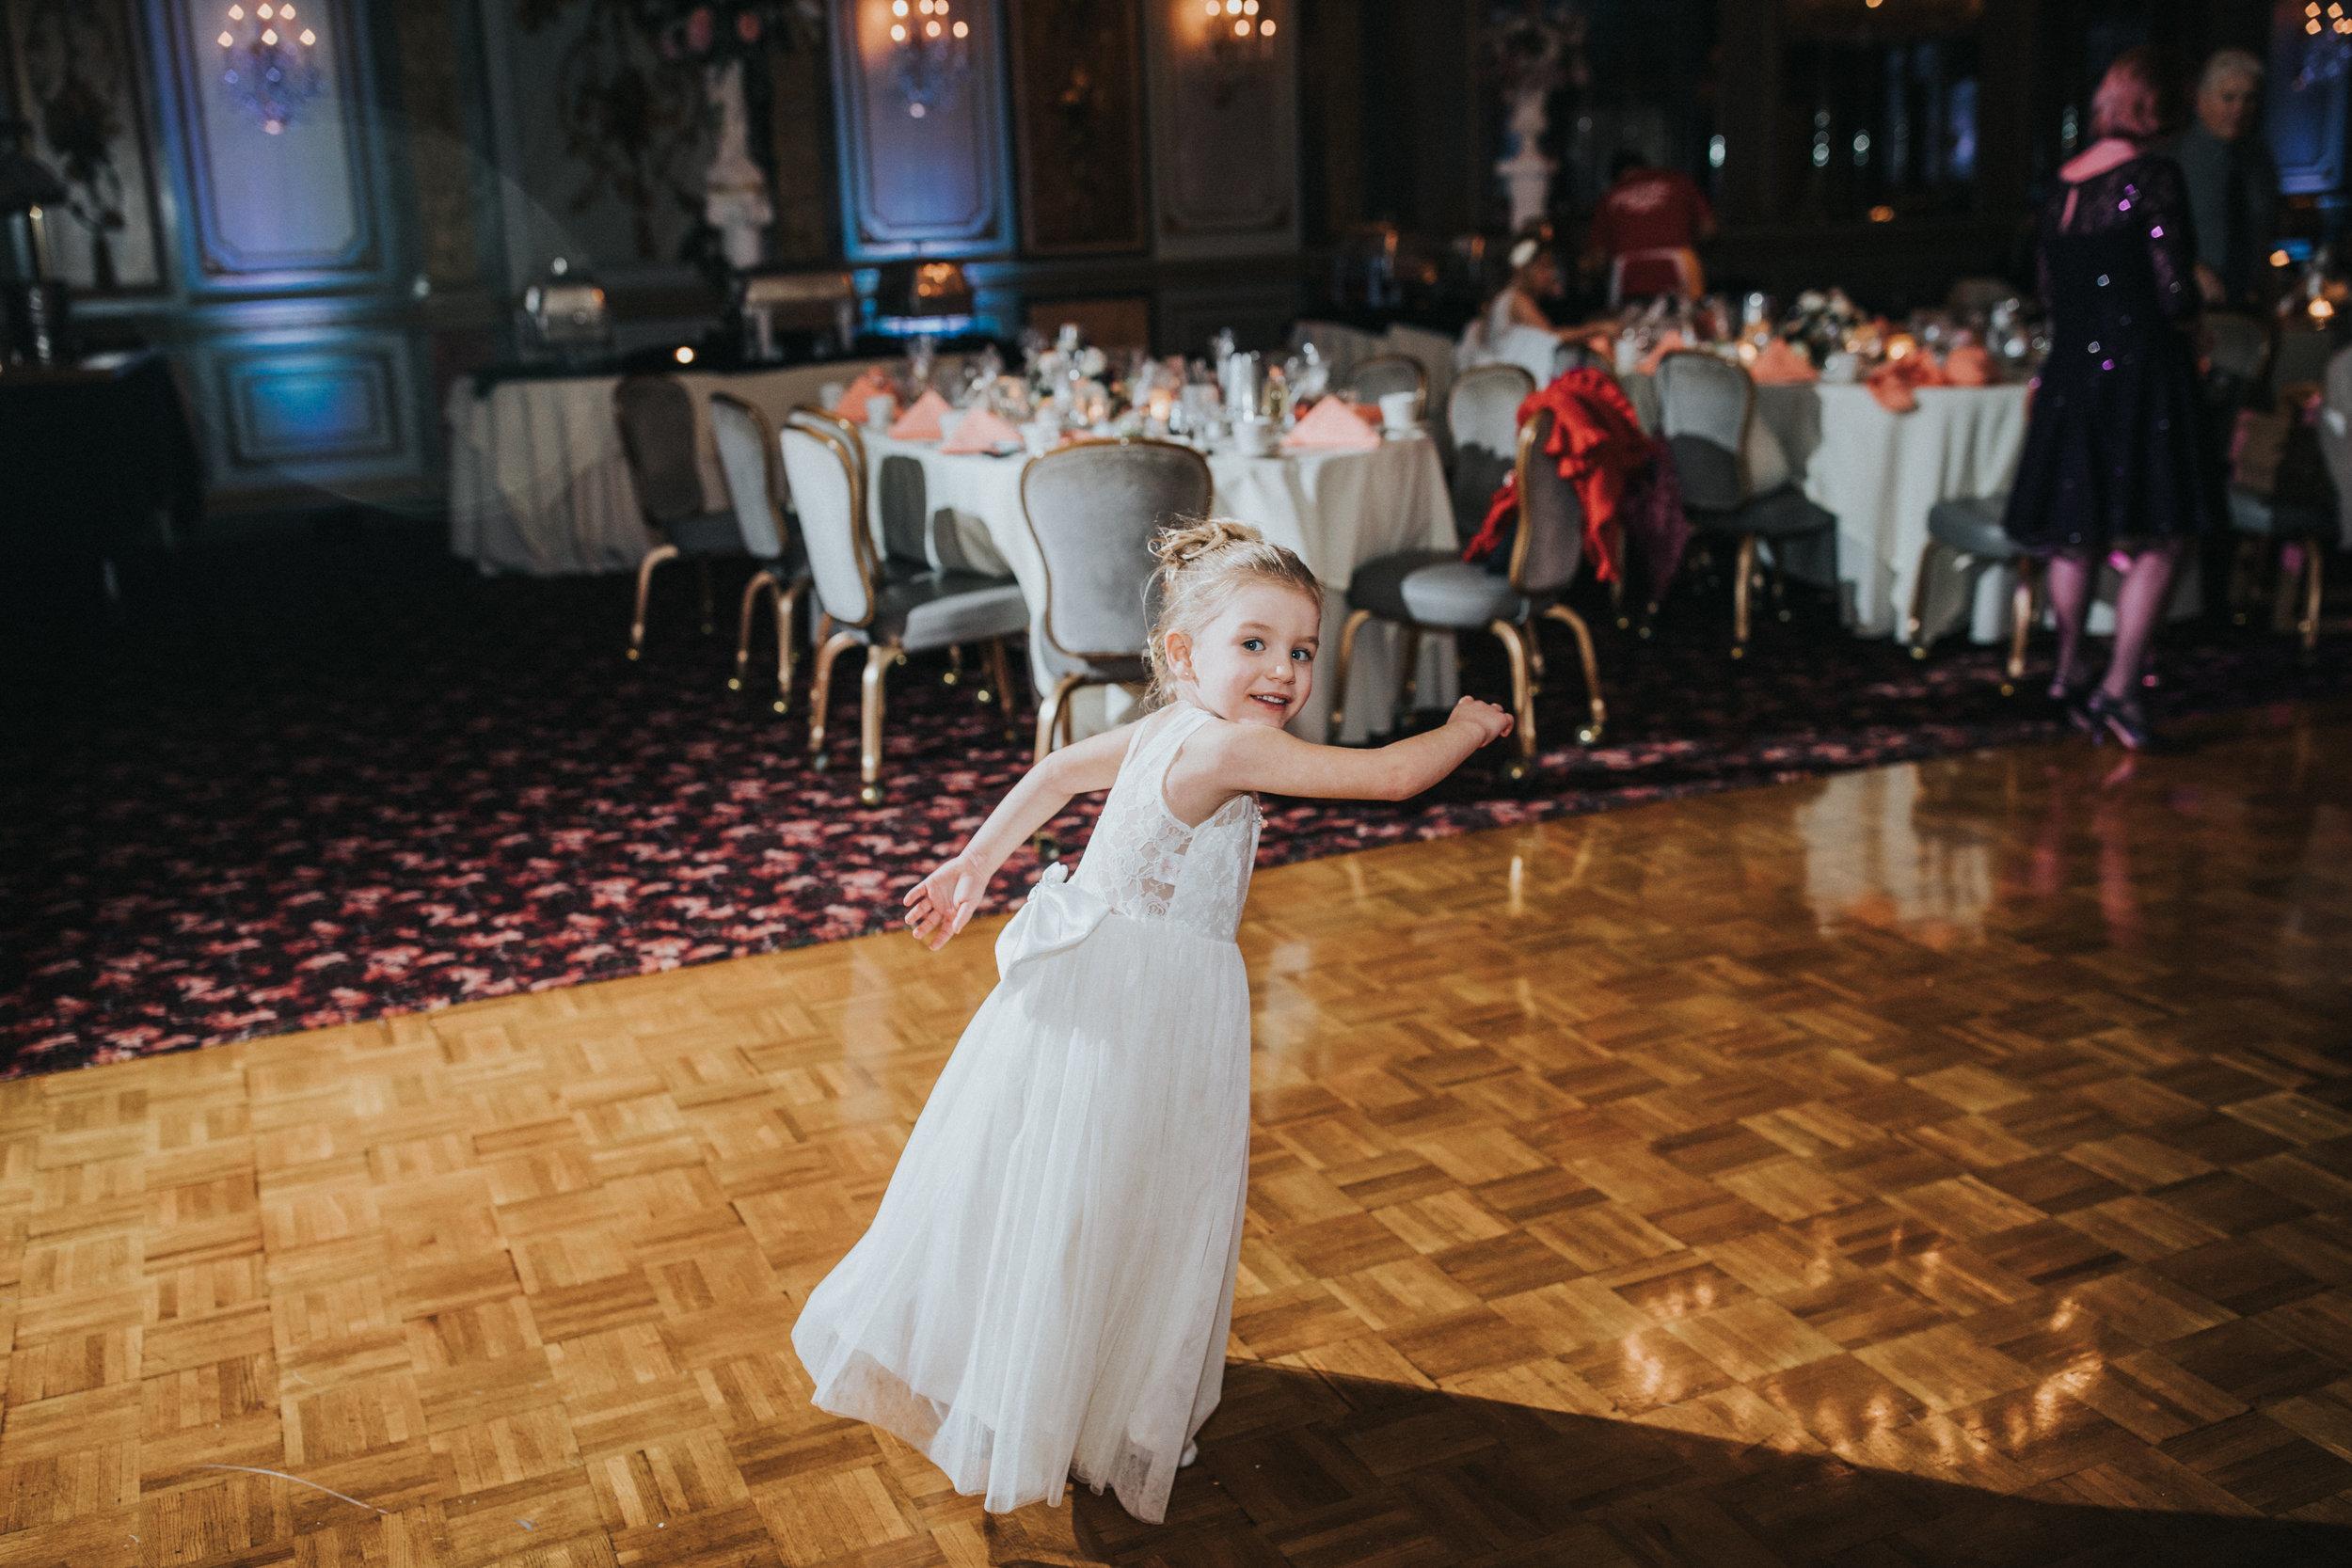 New-Jersey-Wedding-Photography-Fishers-Tudor-House-JennaLynnPhotography-Reception-Kathleen&Eddie-1.jpg